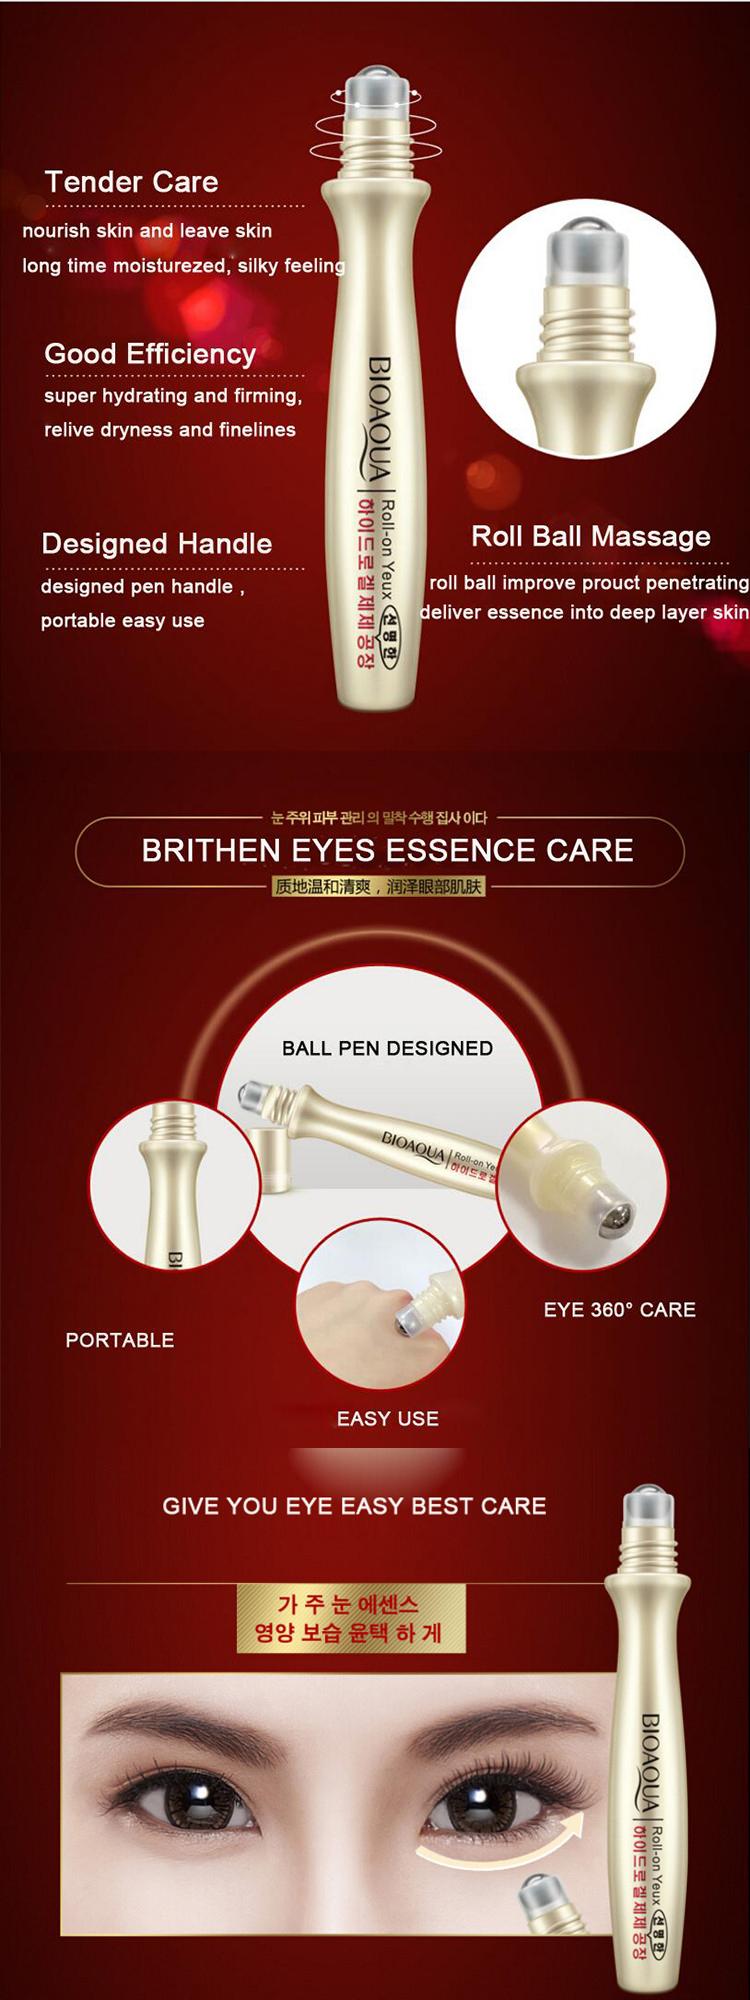 Bioaqua Vivid Roll On Esensi Hydrating Anti Kerut Penuaan Eye Care Essense Serum Mata Keriput Lingkaran Hitam Remover